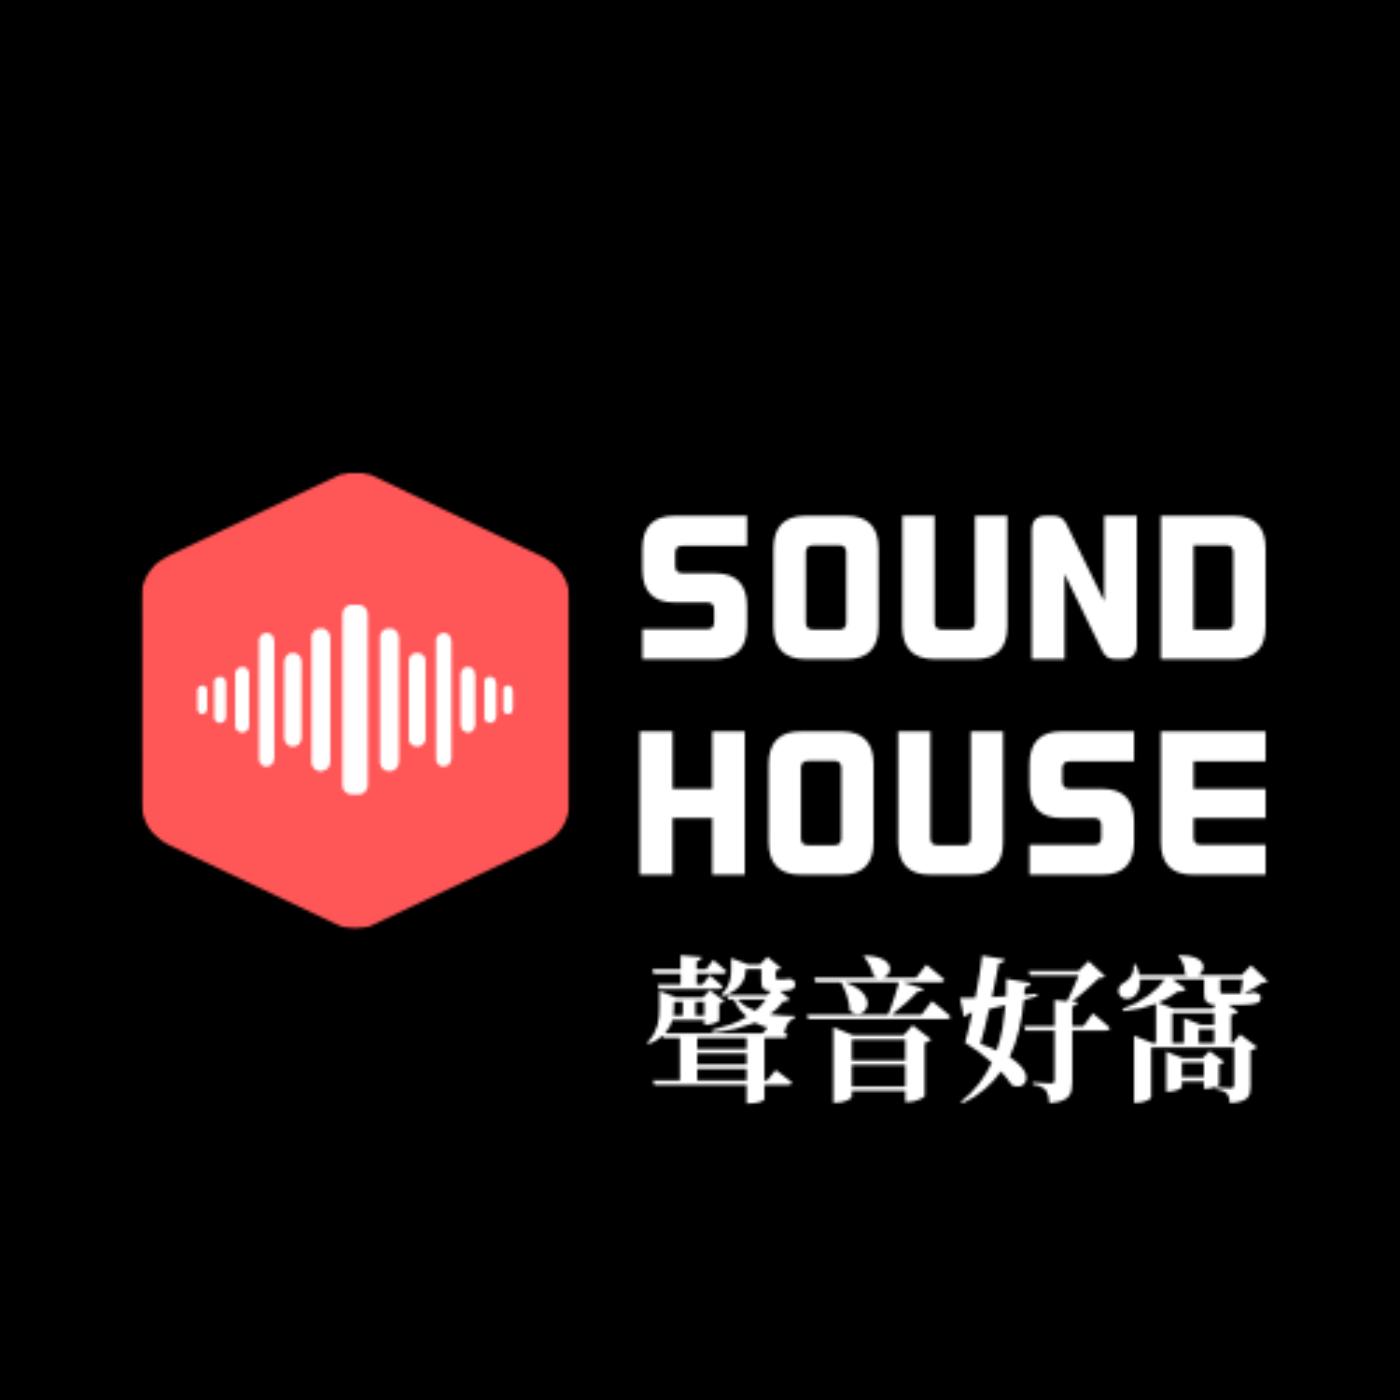 SOUND HOUSE 聲音好窩